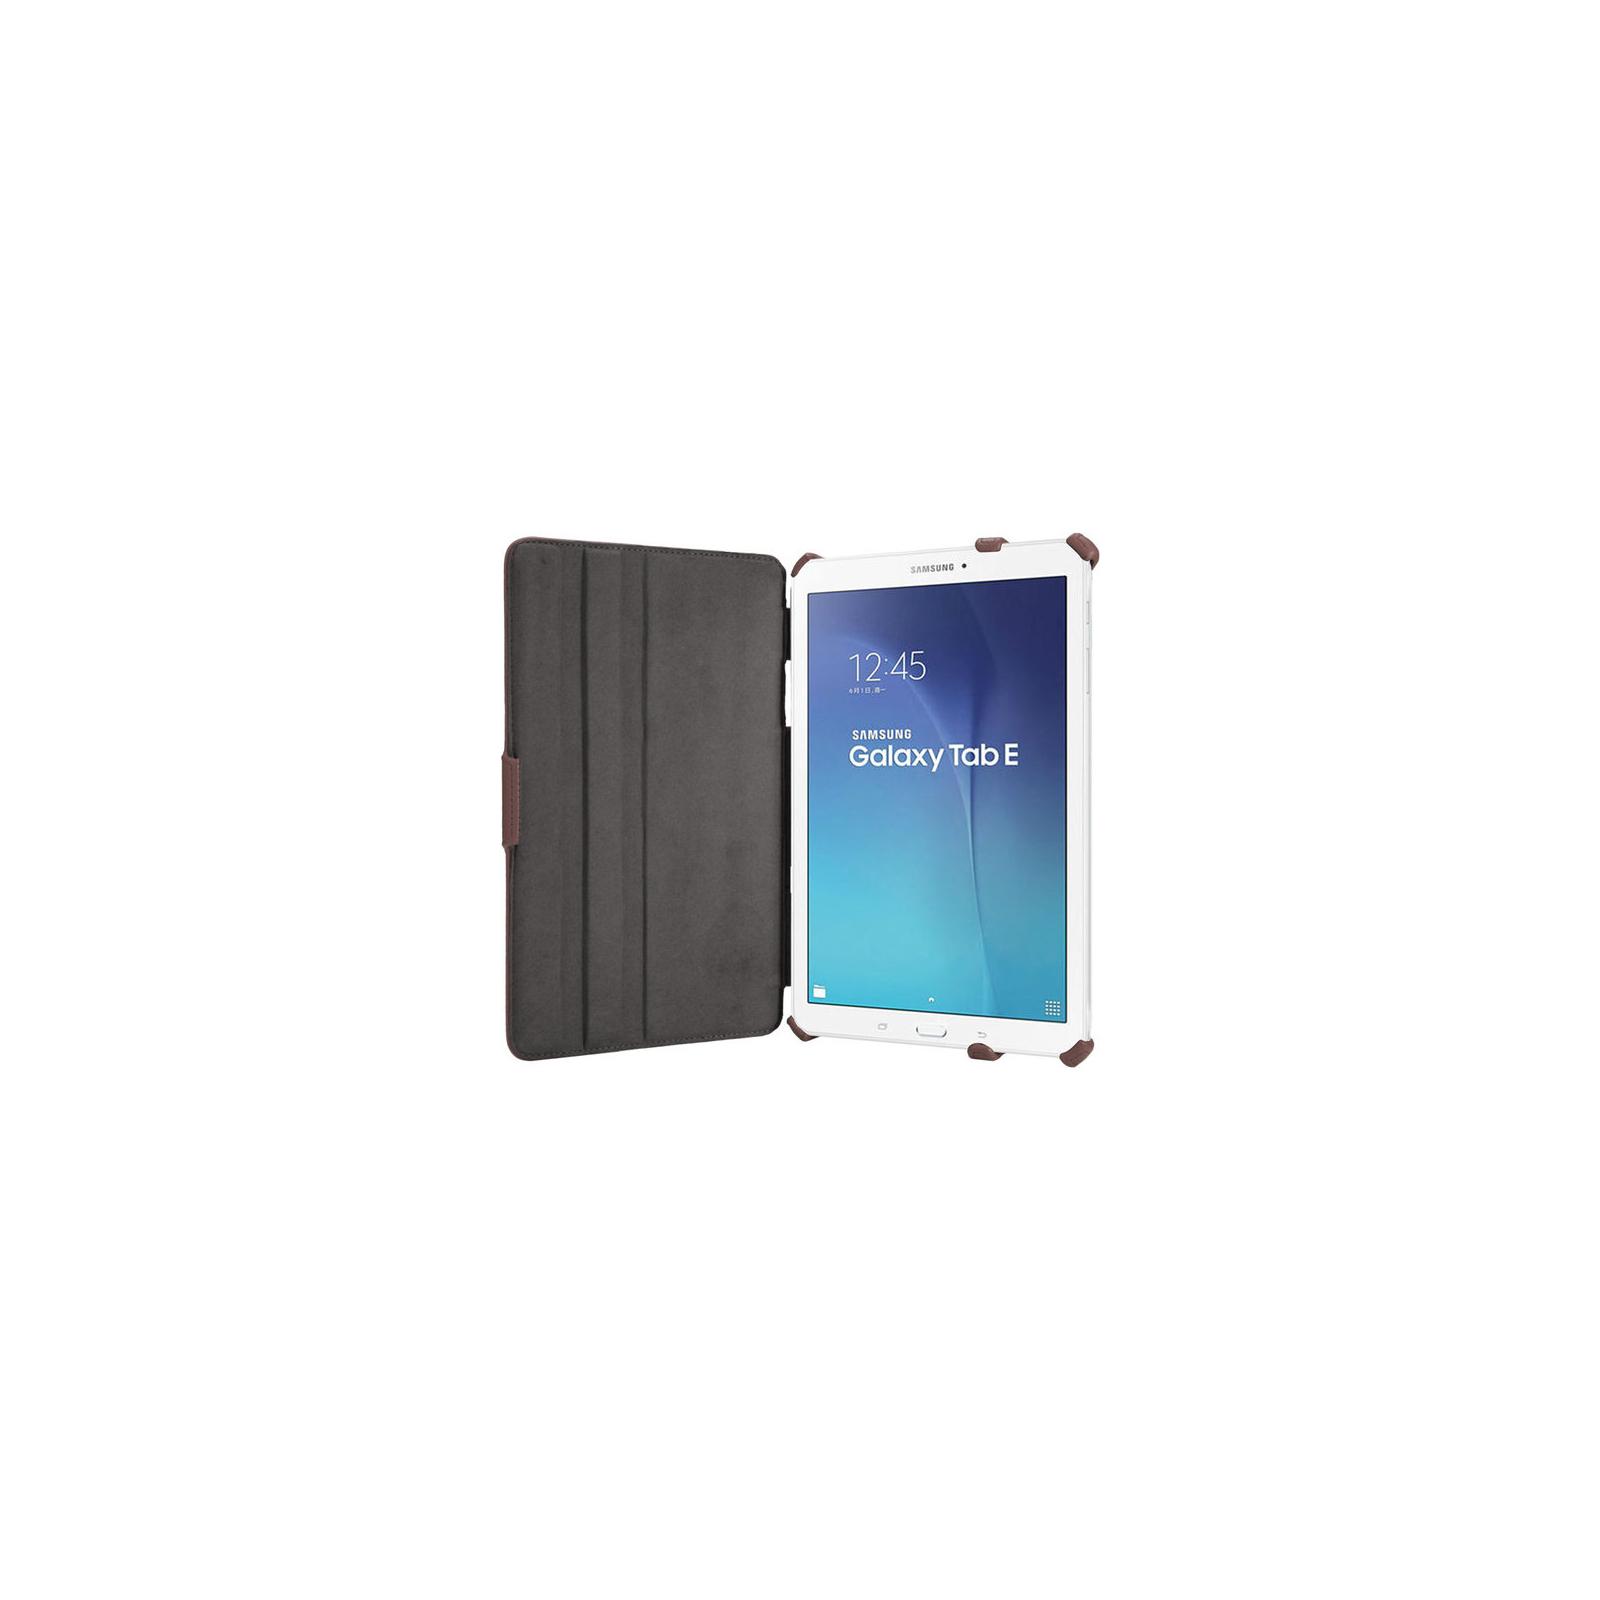 Чехол для планшета AirOn для Samsung Galaxy Tab E 9.6 brown (4822352777128) изображение 8